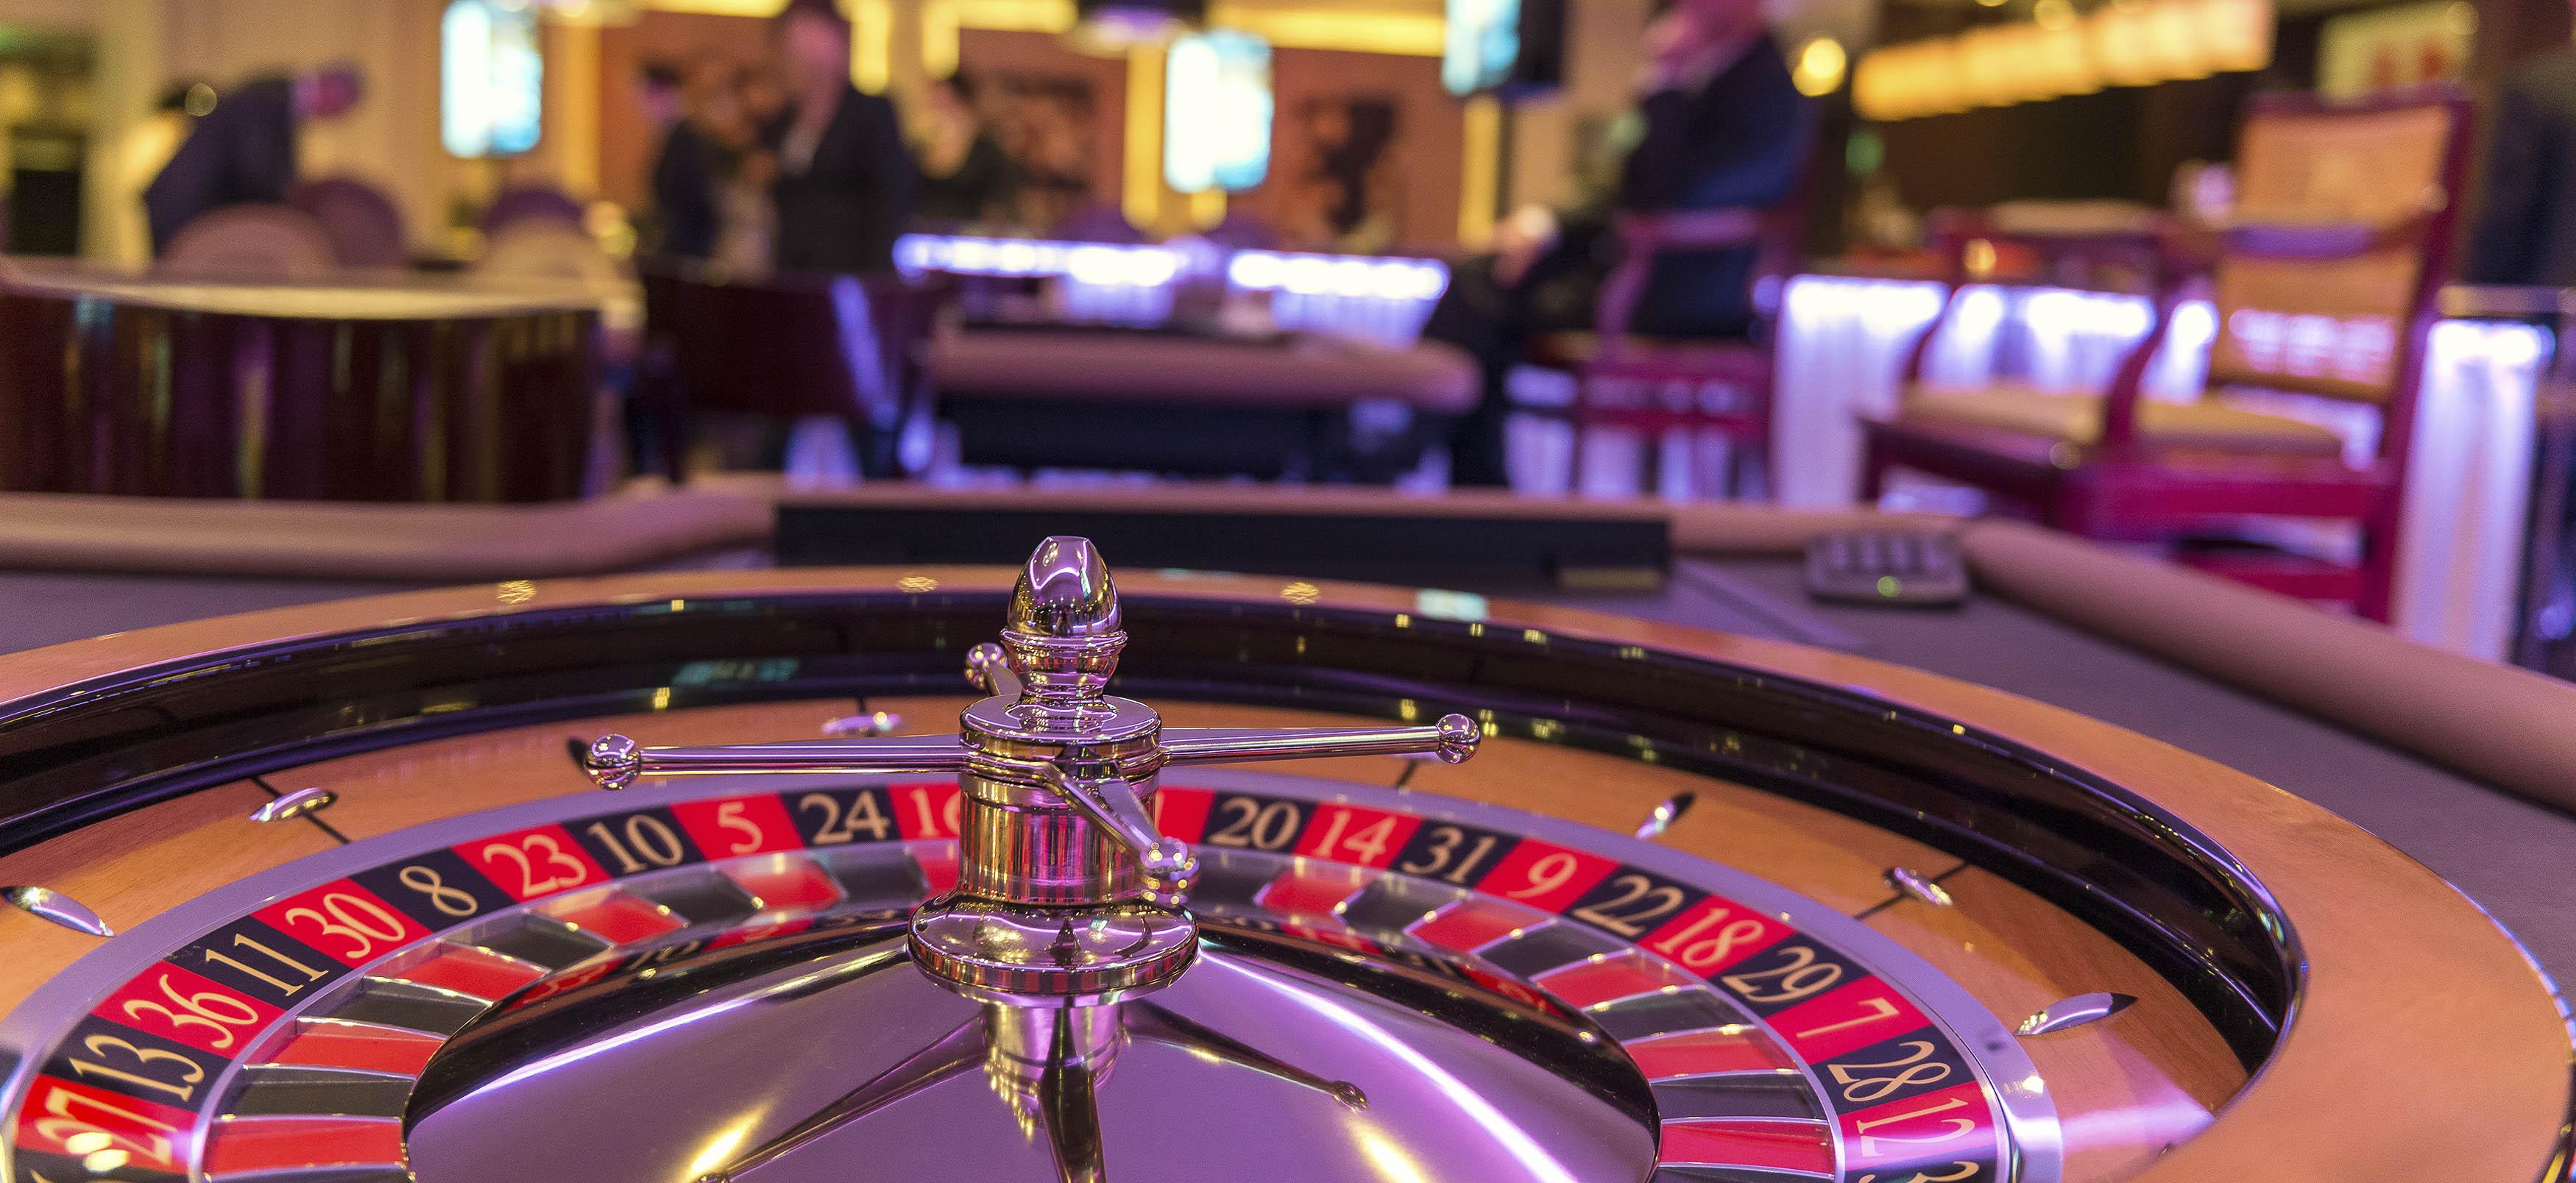 Evian Reisundoridmoowors Jackpot Jackpot Casino Casino Evian Reisundoridmoowors WYDH9IE2